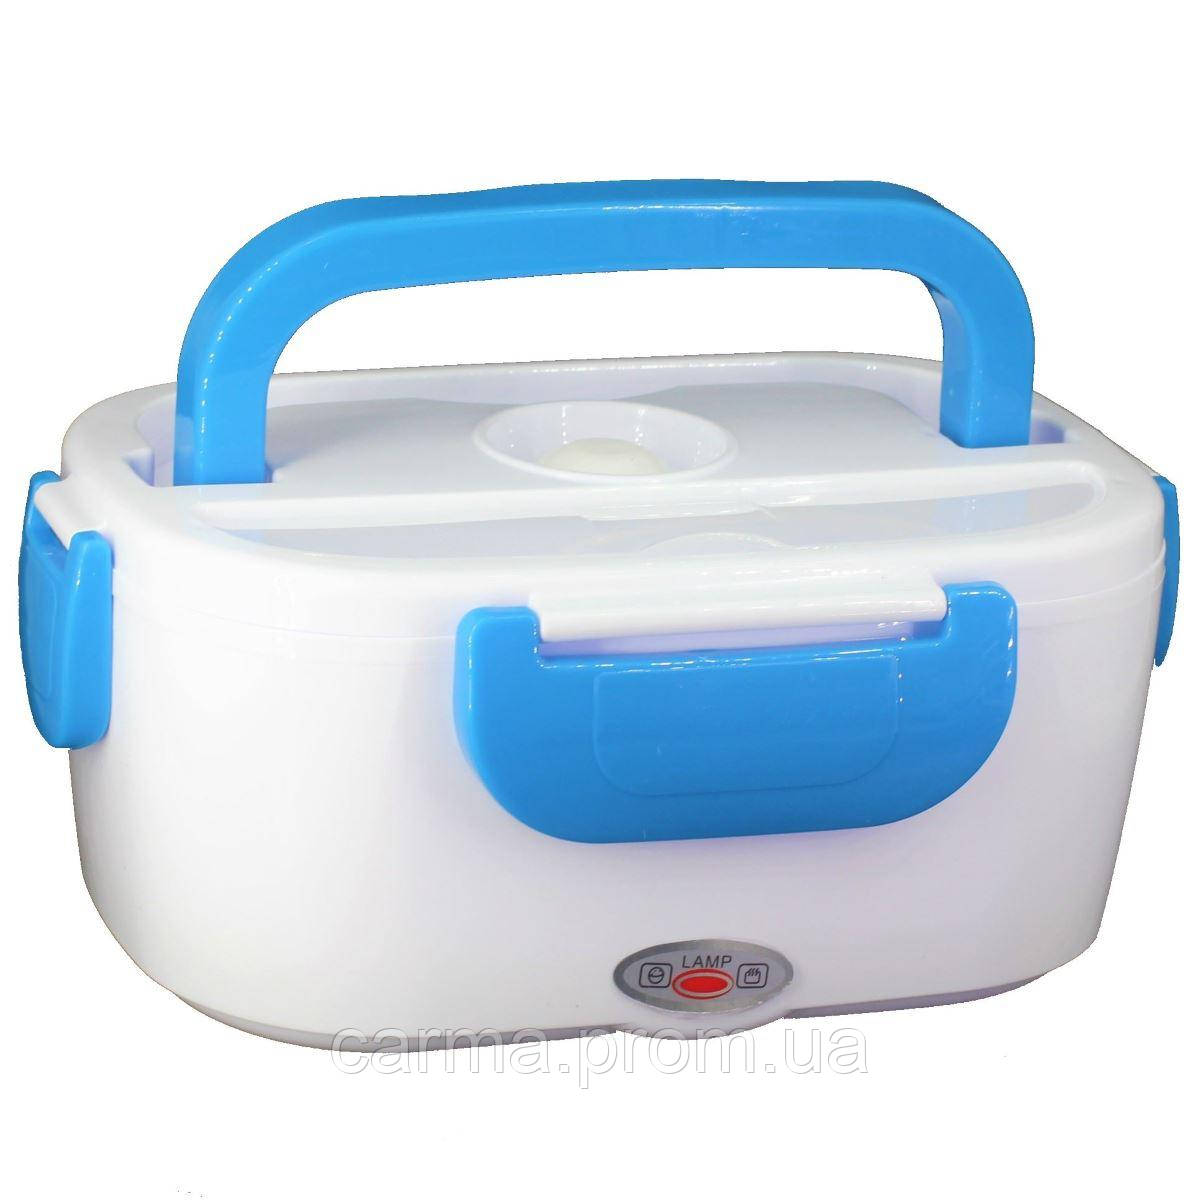 Электрический ланч бокс с подогревом от сети 220В Electric Lunch Box 1.05 л Белый с синим